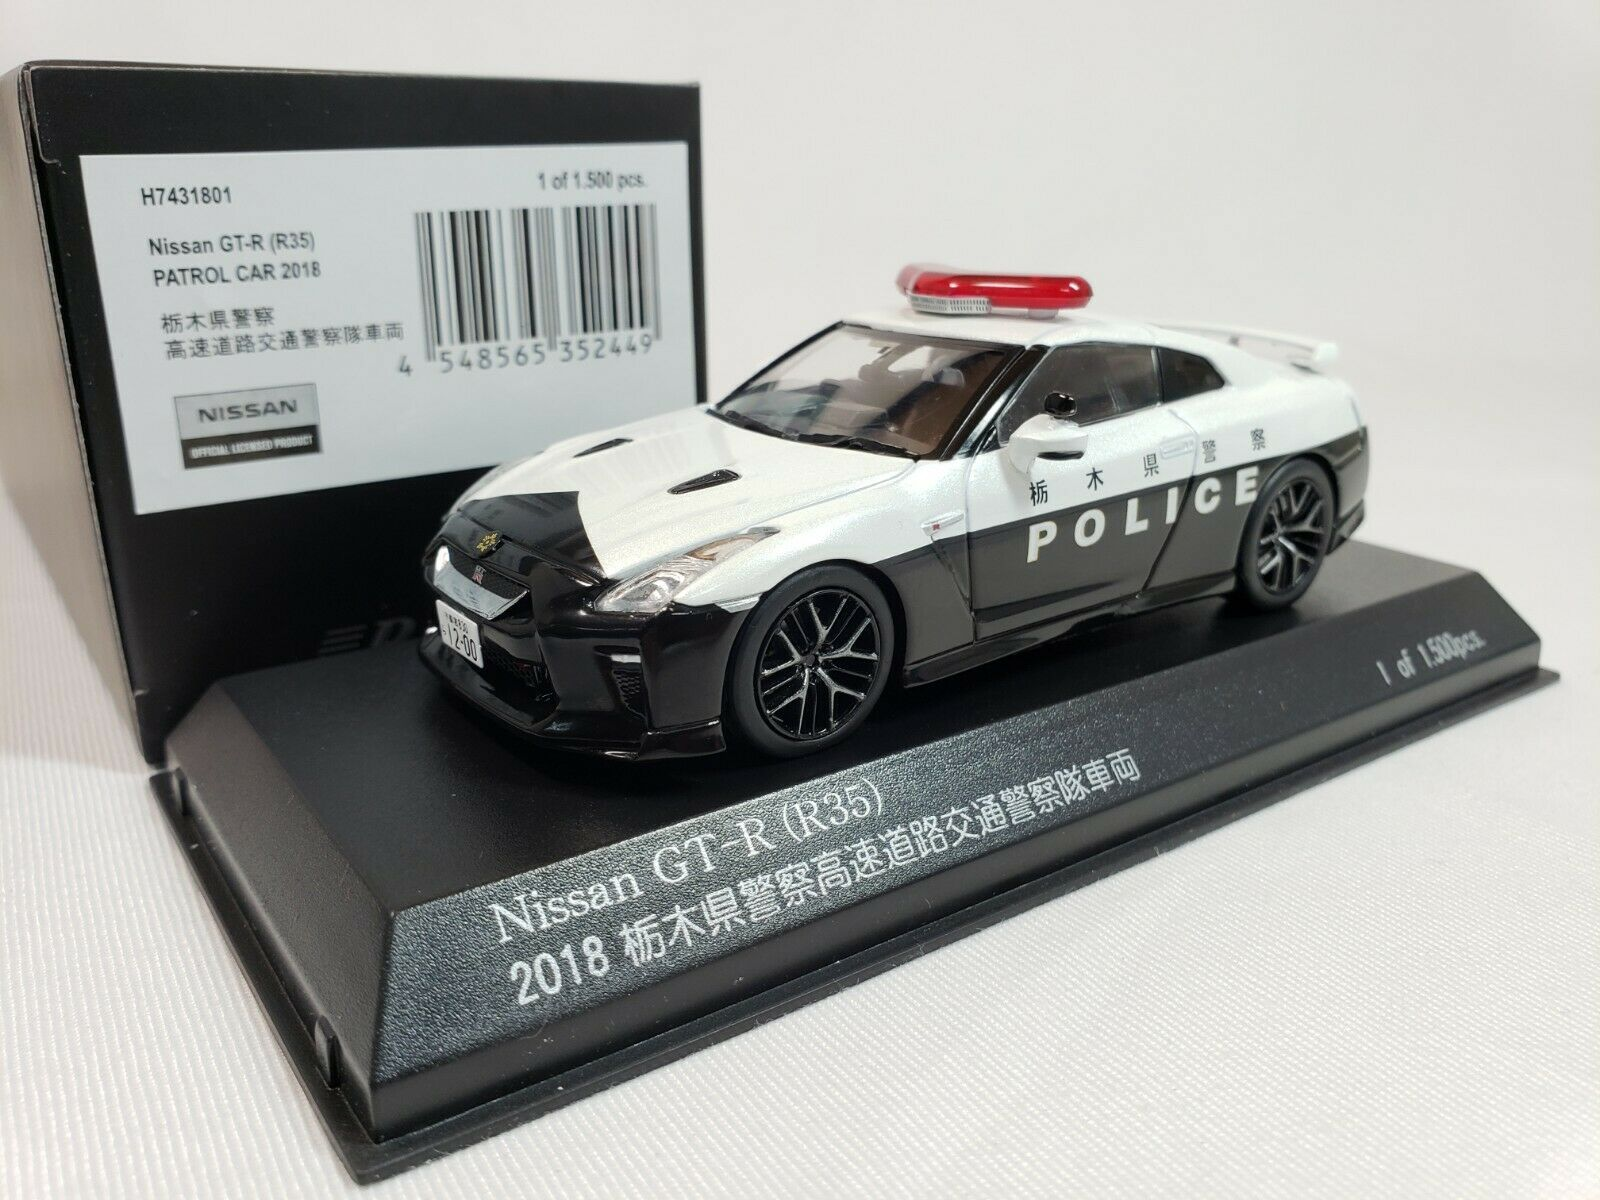 1 43 Kyosho Rai's Nissan Nissan Nissan Skyline GT-R R35 Facelift 2018 Japan Police Patrol Car 351509